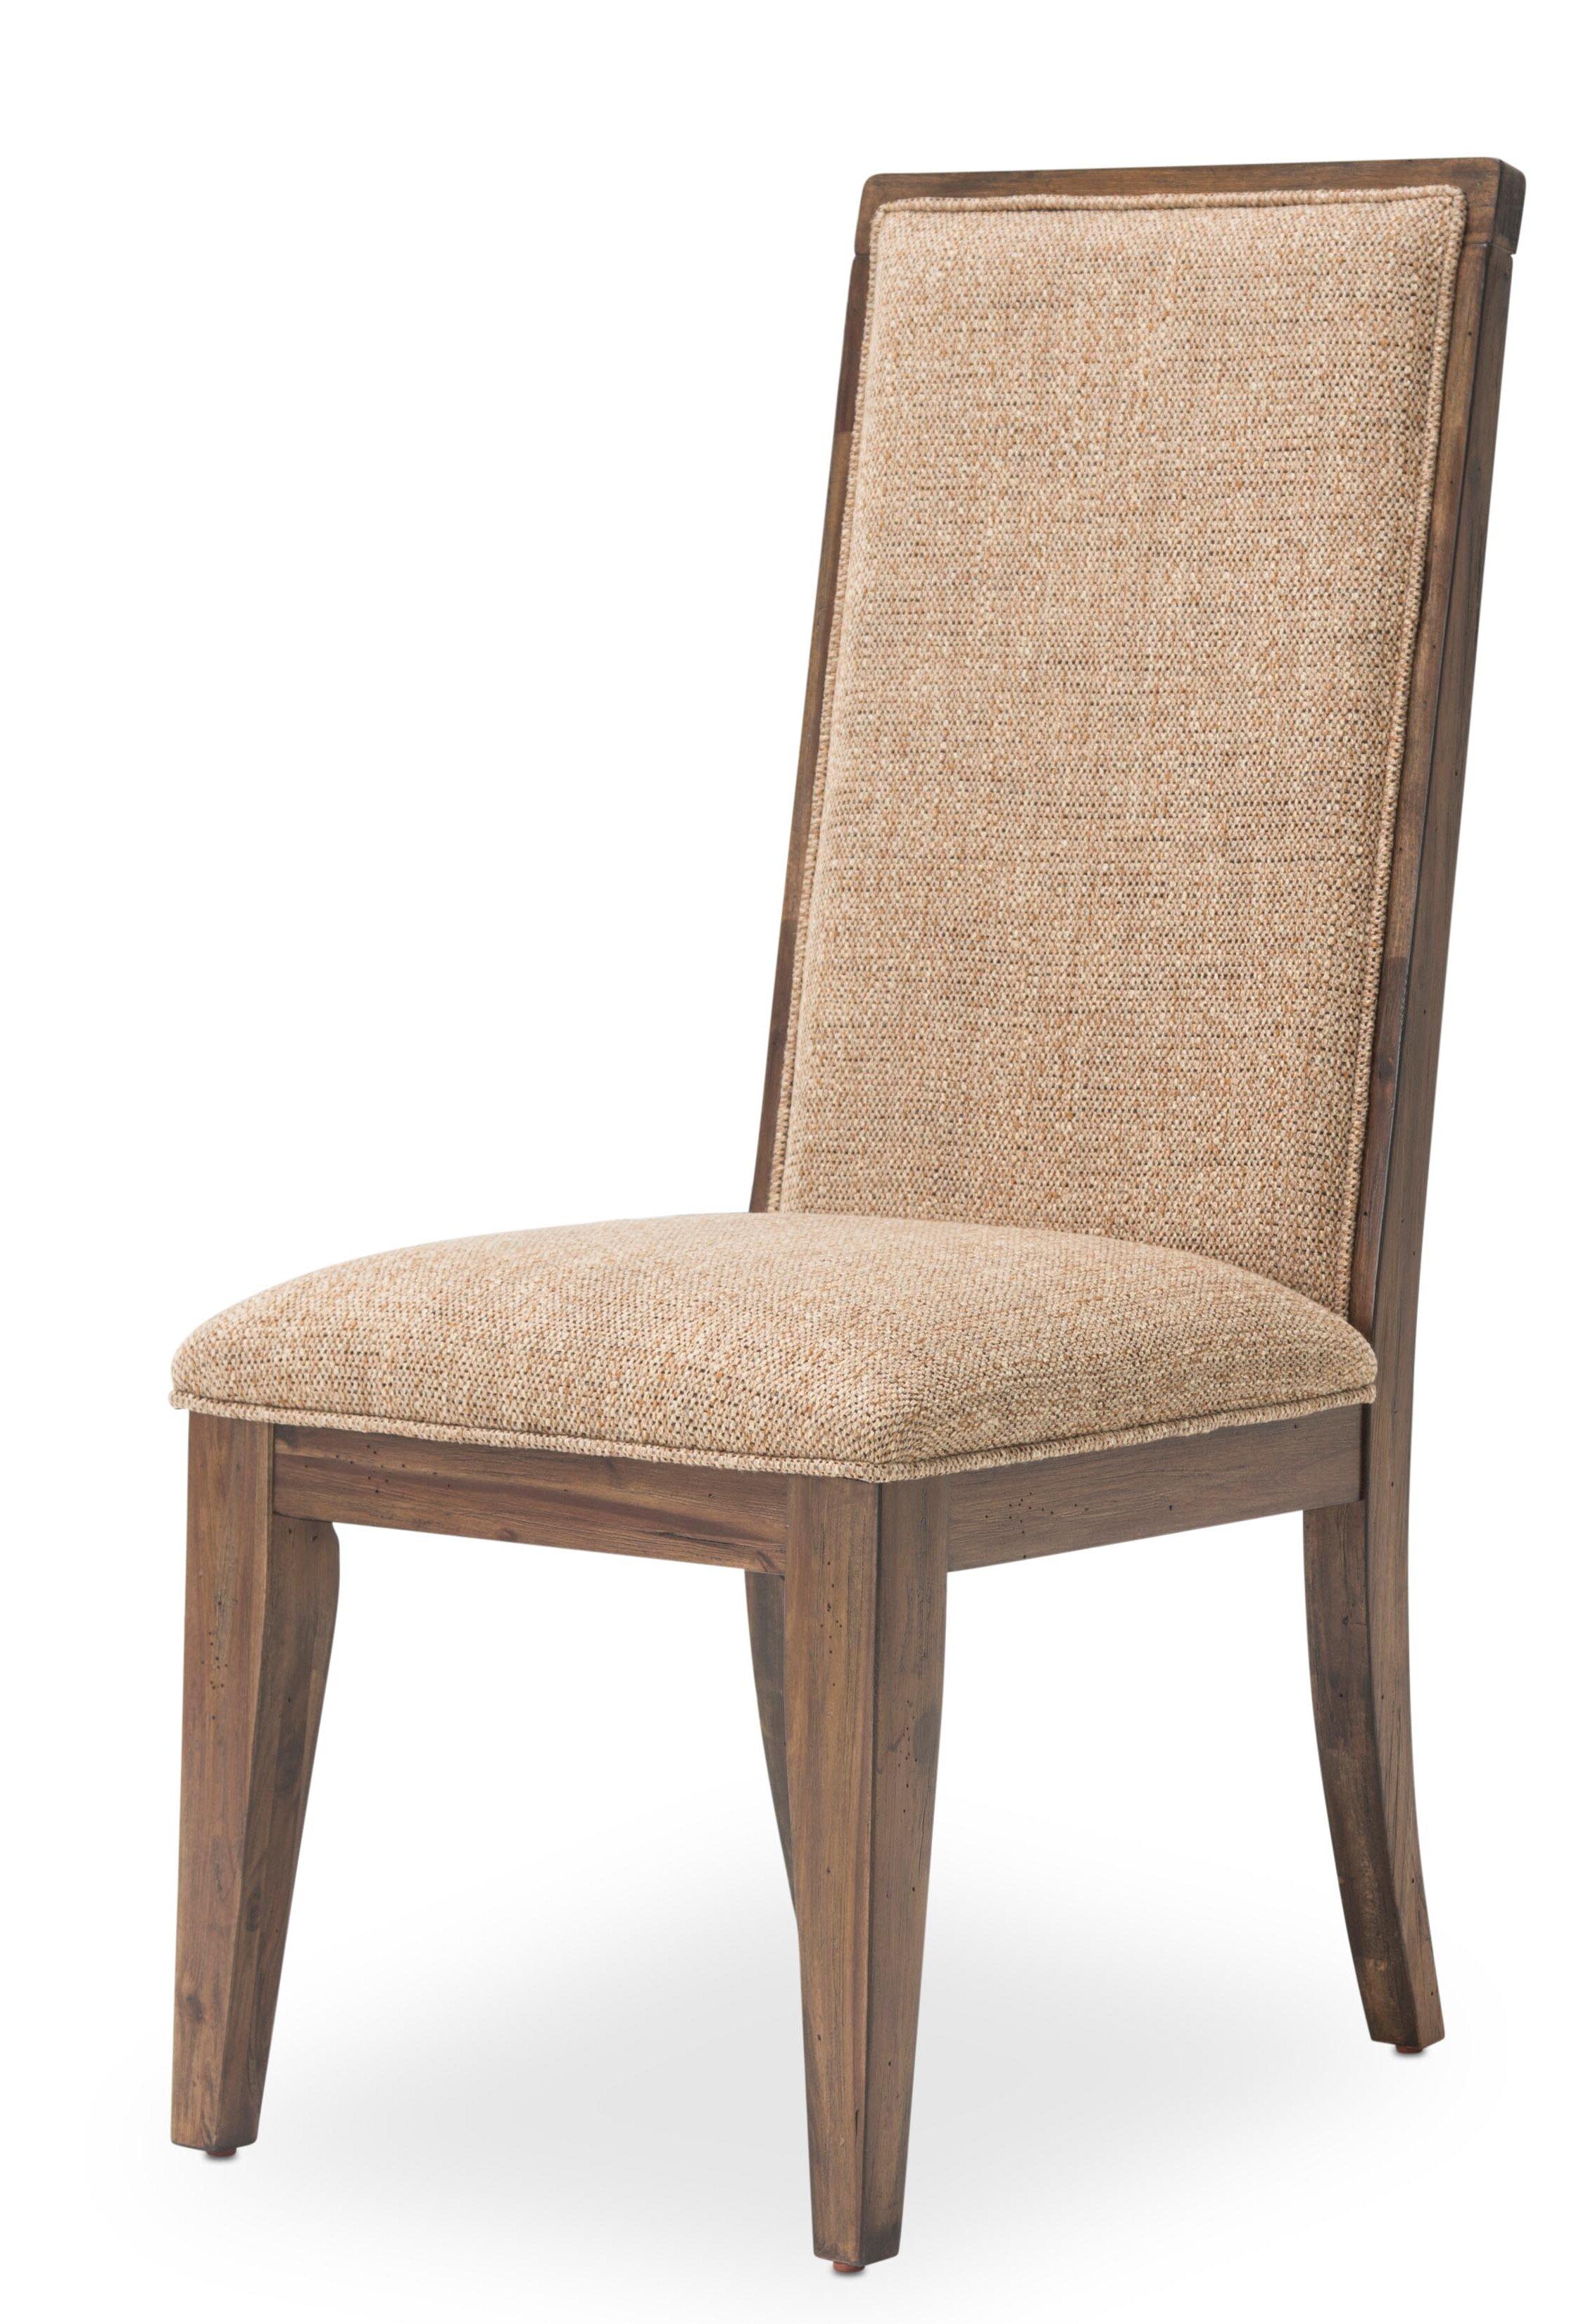 Michael Amini Kathy Ireland Home Designs Carrollton Upholstered Side Chair In Rustic Ranch Wayfair